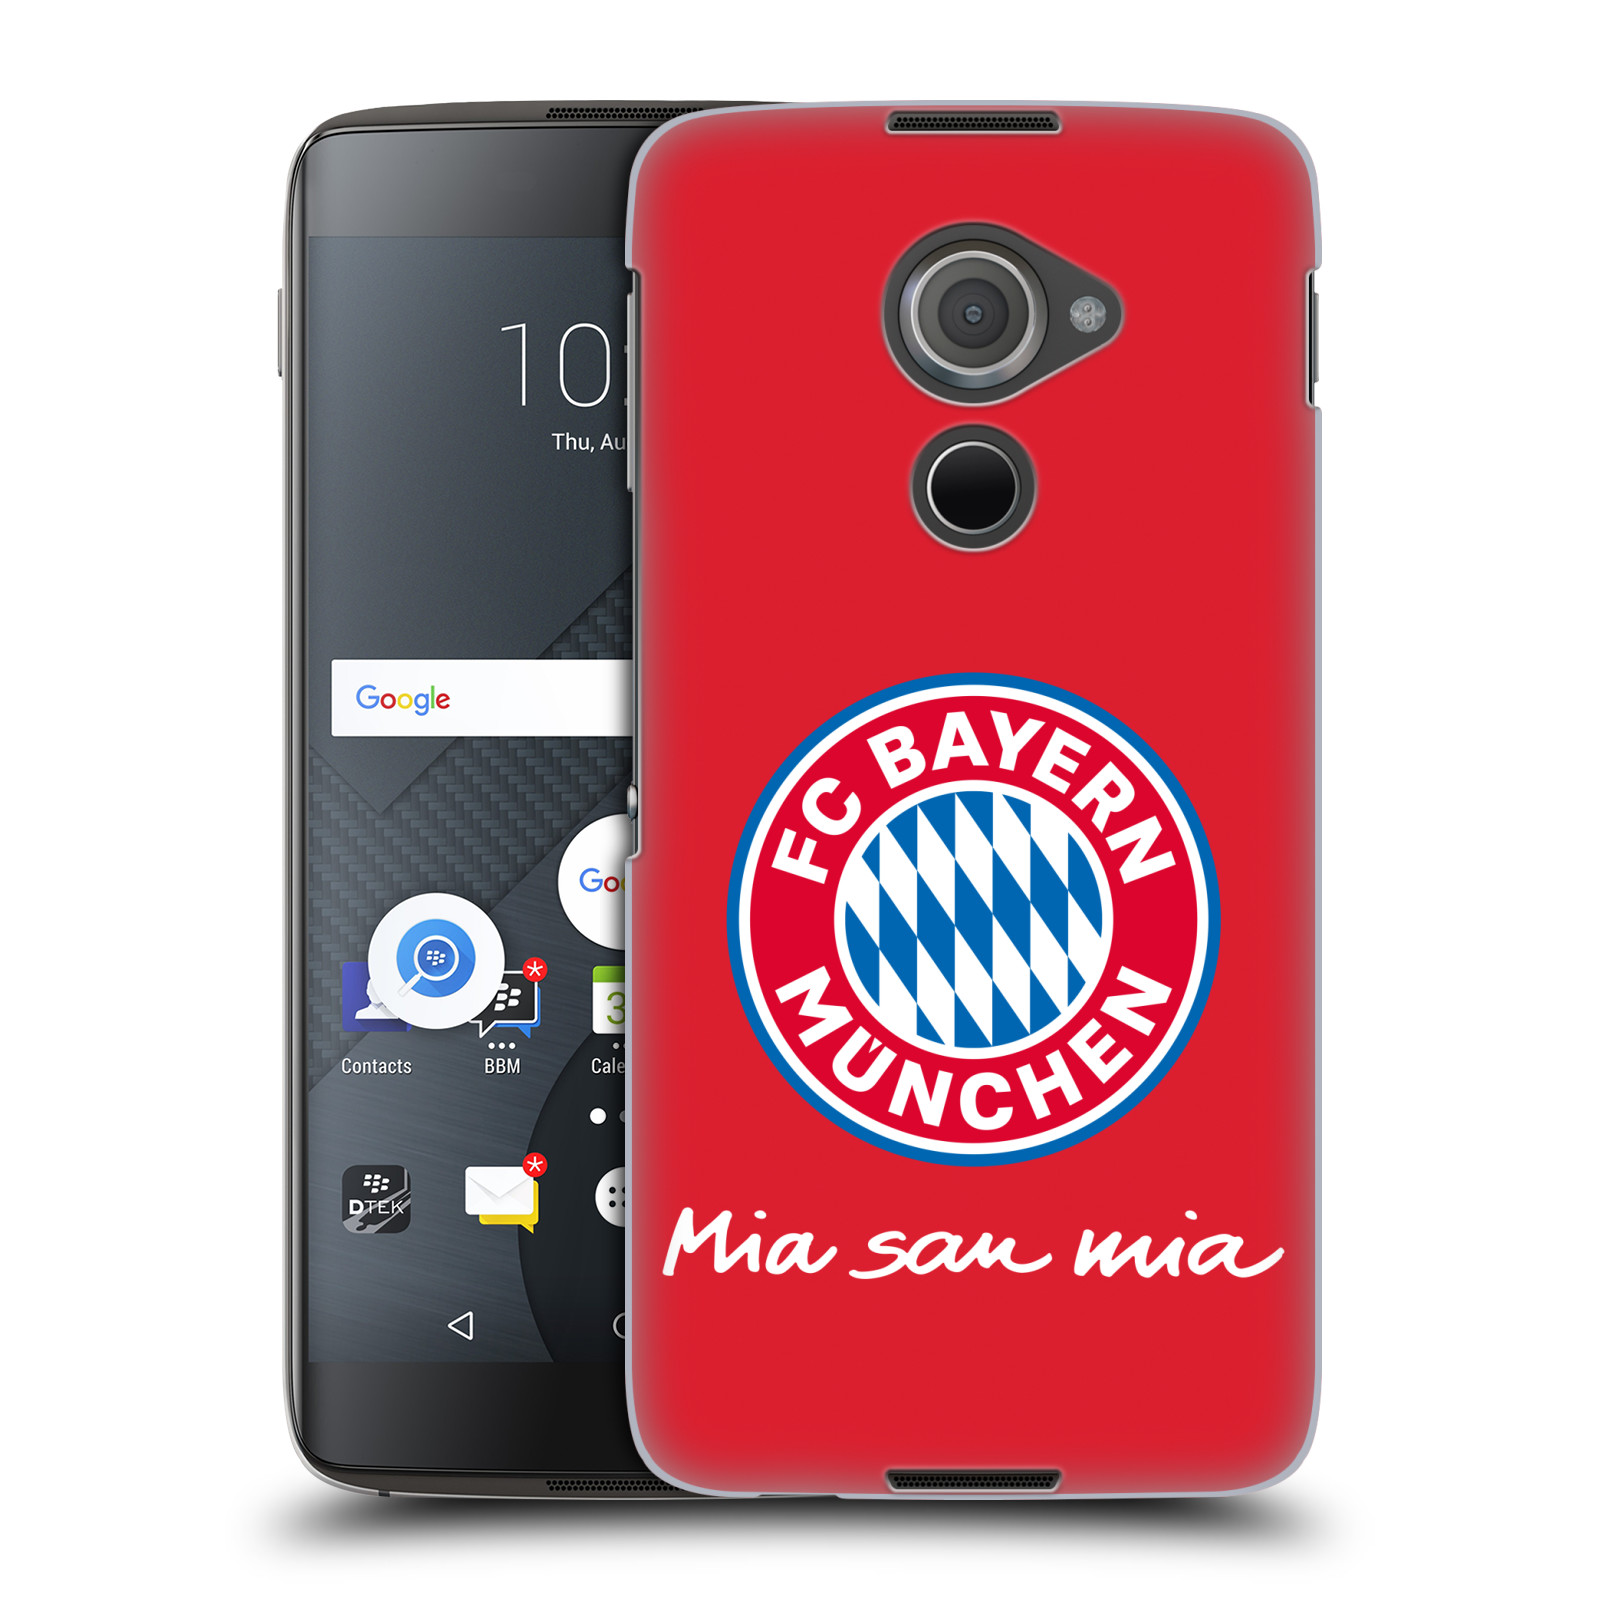 Plastové pouzdro na mobil Blackberry DTEK60 (Argon) - Head Case - FC Bayern Mnichov - Mia san mia